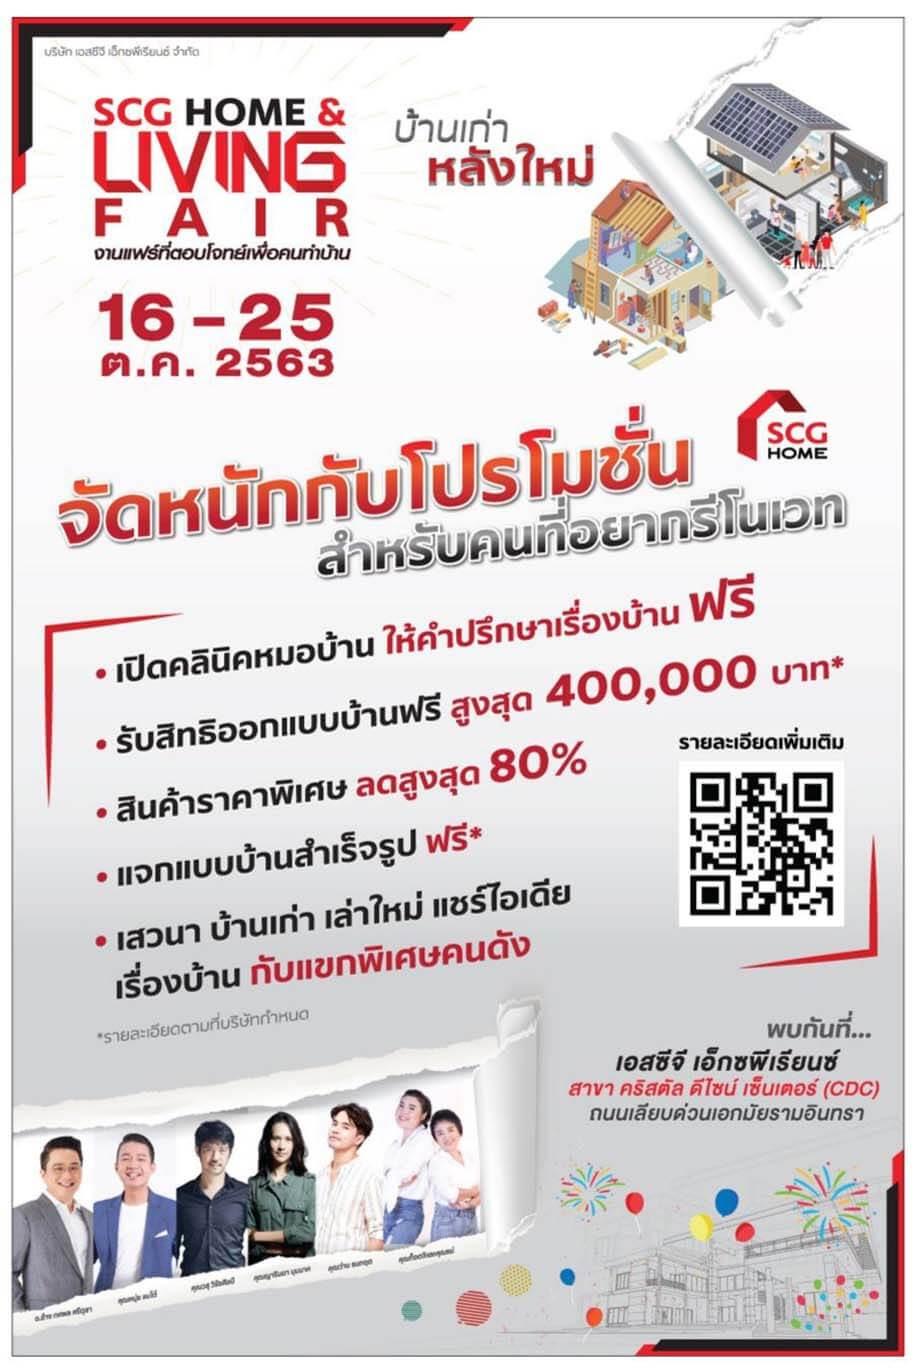 SCG HOME & Living Fair 2020